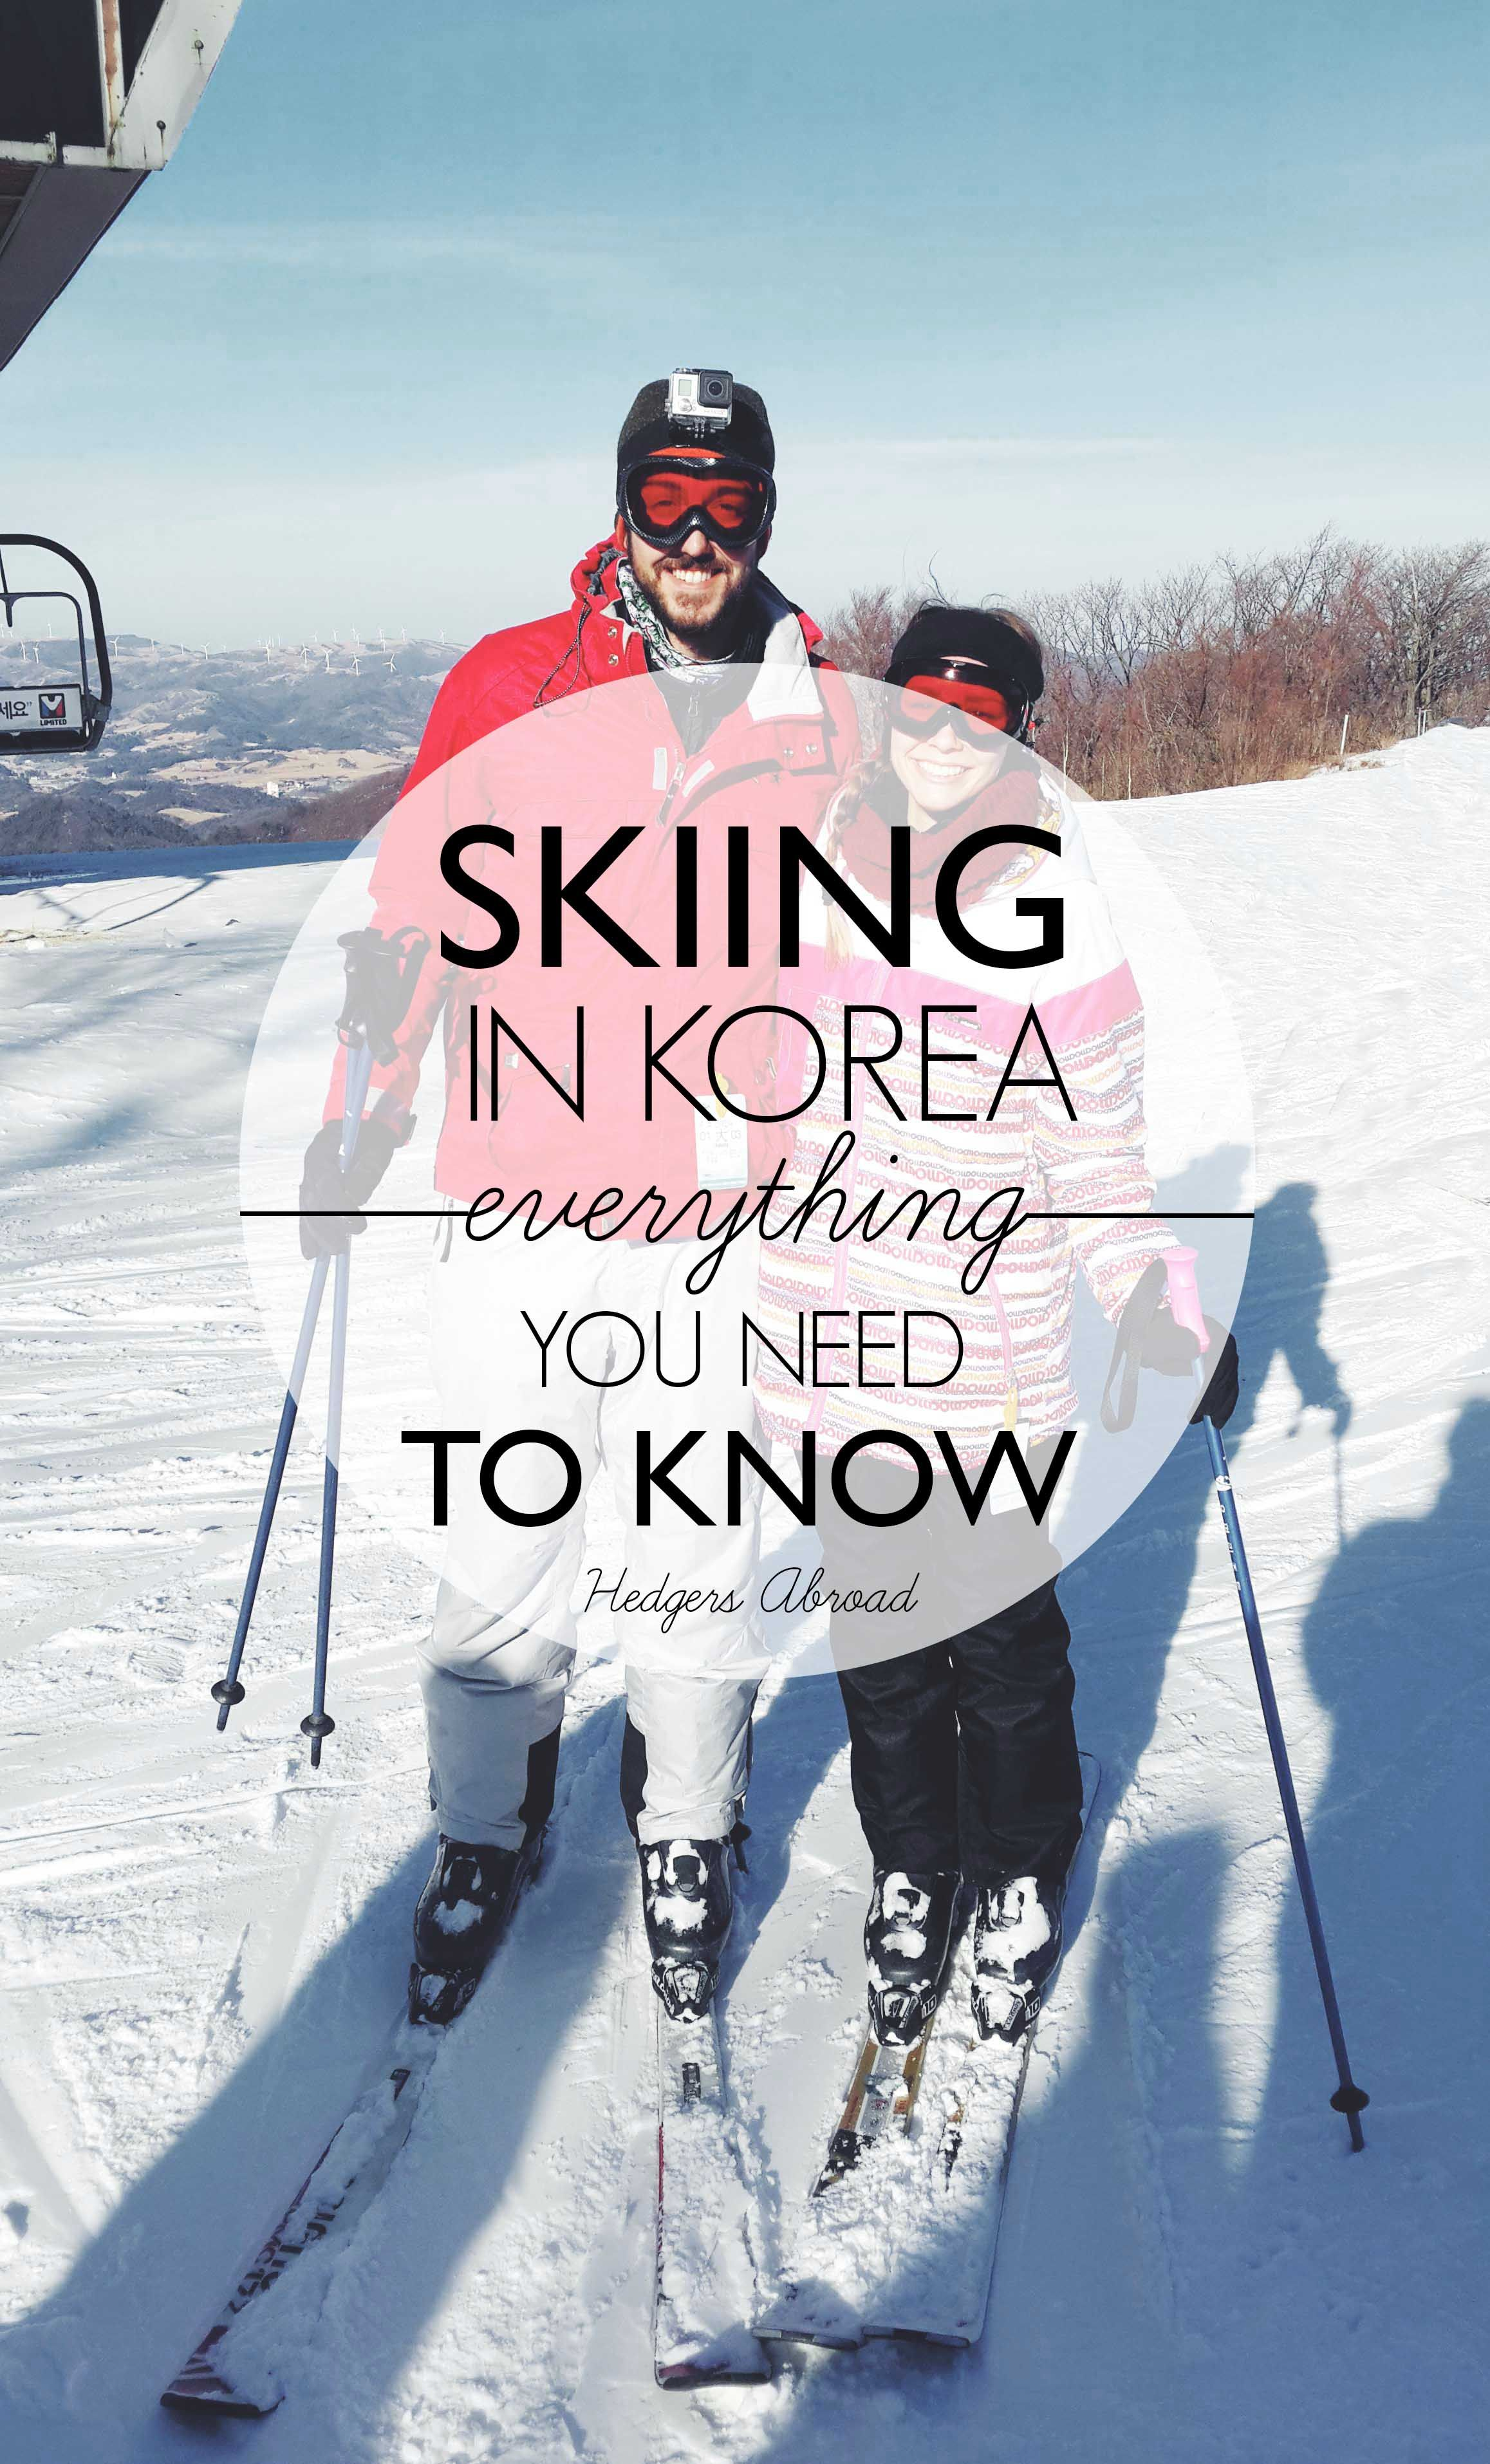 a guide to skiing in south korea korea s dkorea. Black Bedroom Furniture Sets. Home Design Ideas